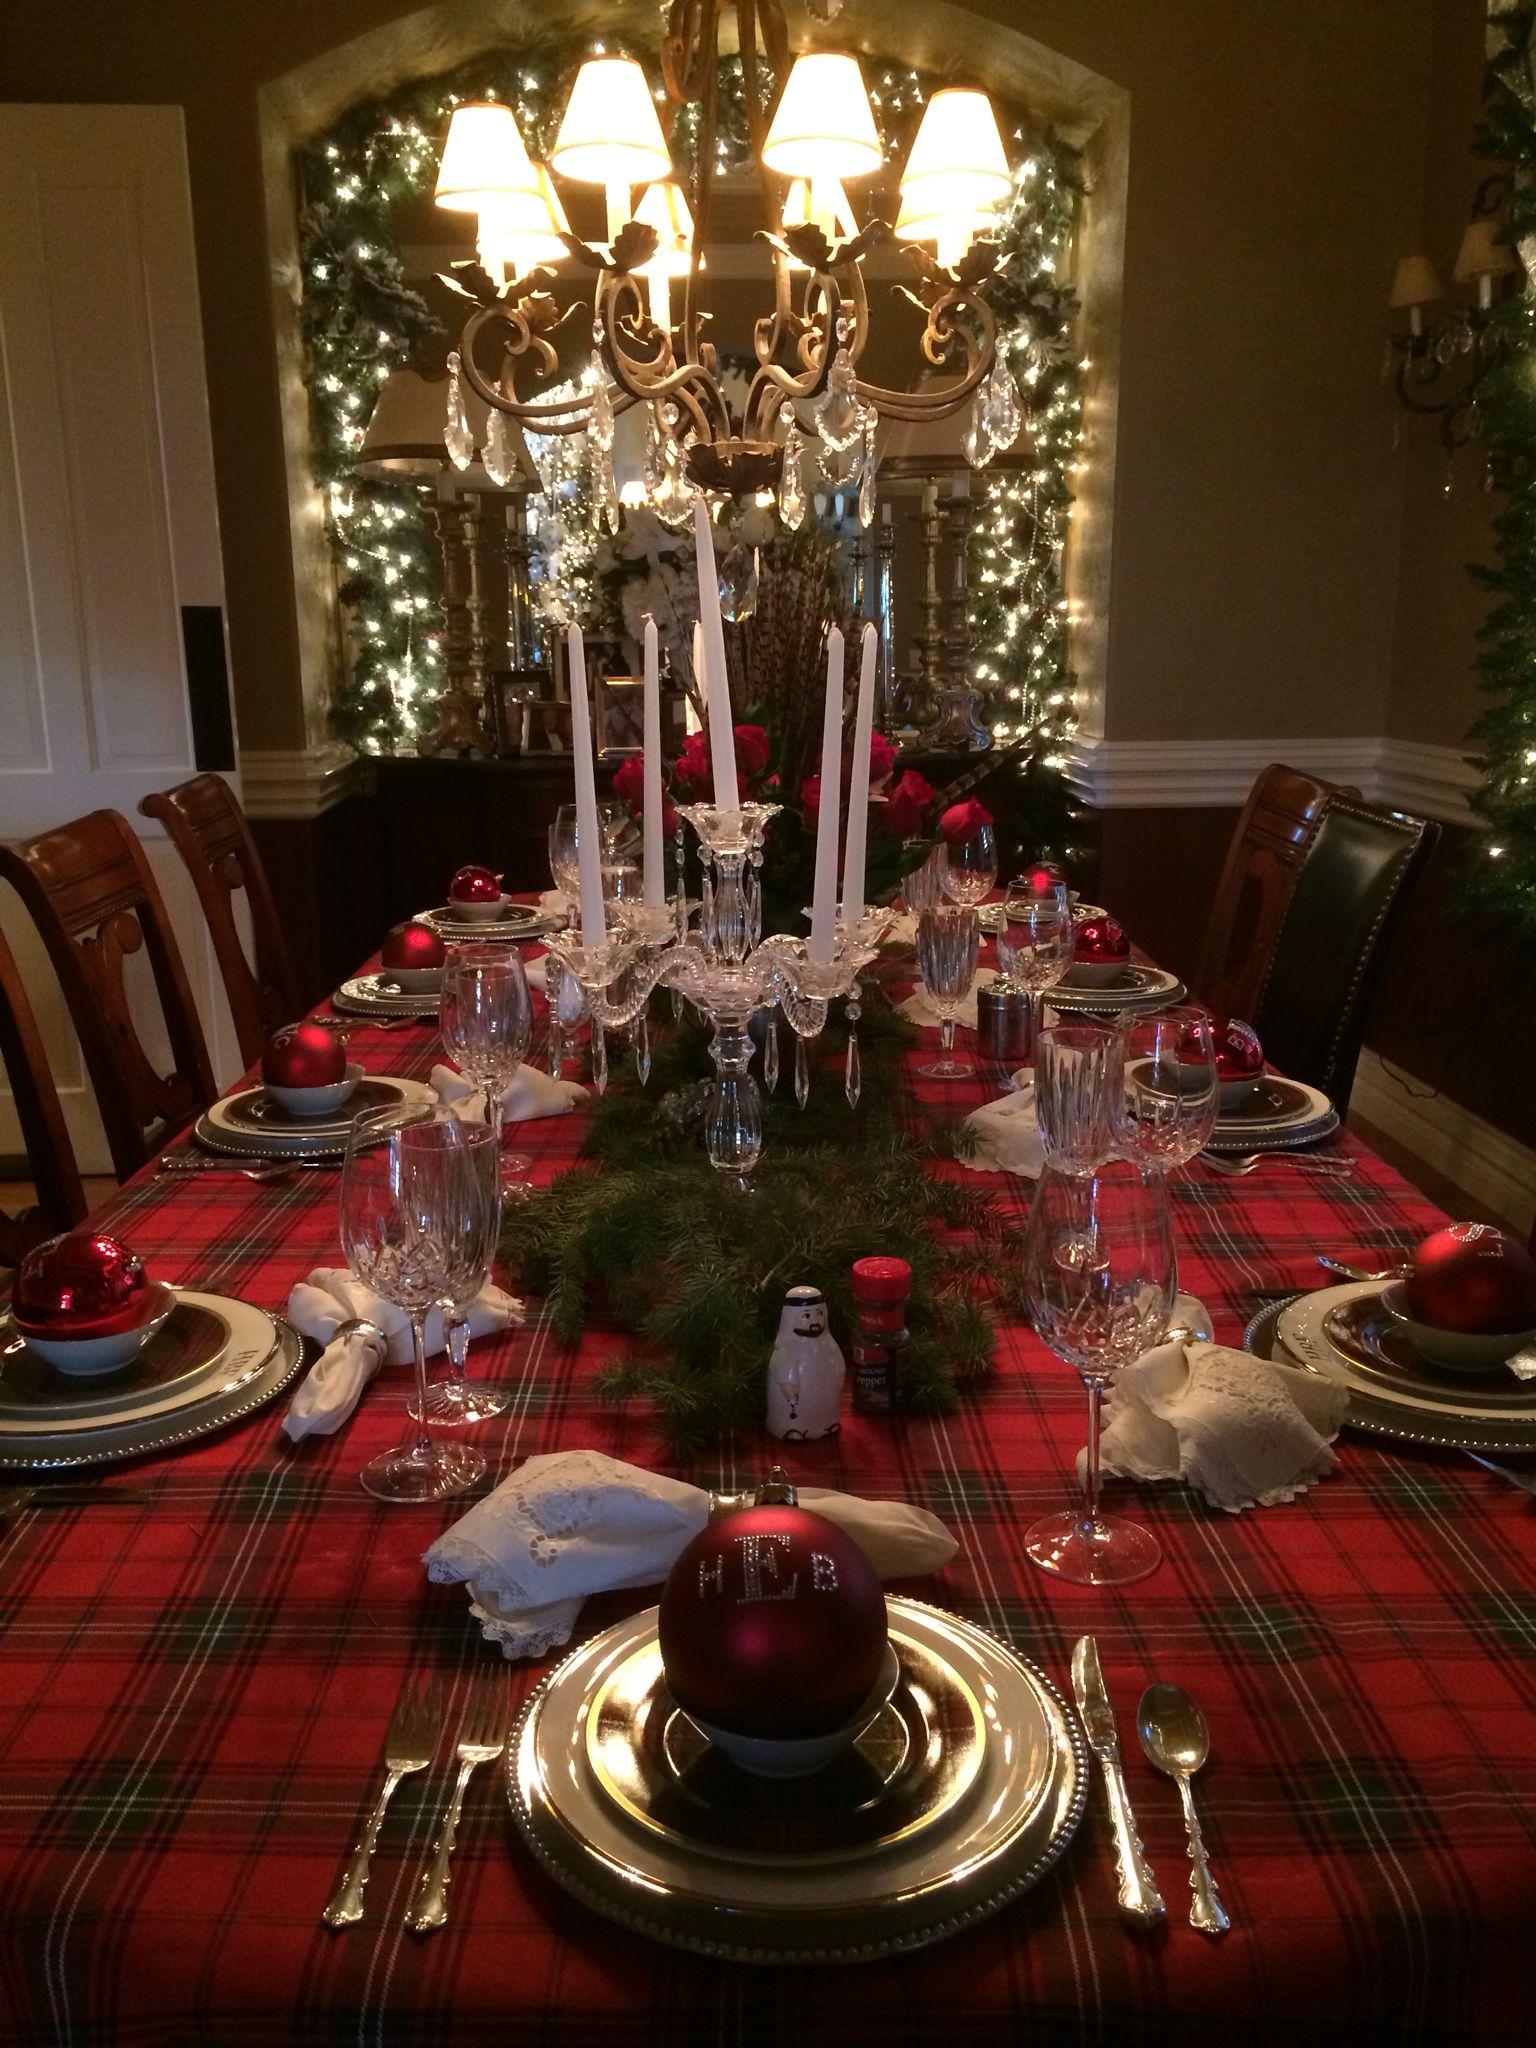 Christmas Eve Dinner Table Christmas Table Christmas Dinner Table Christmas Table Decorations